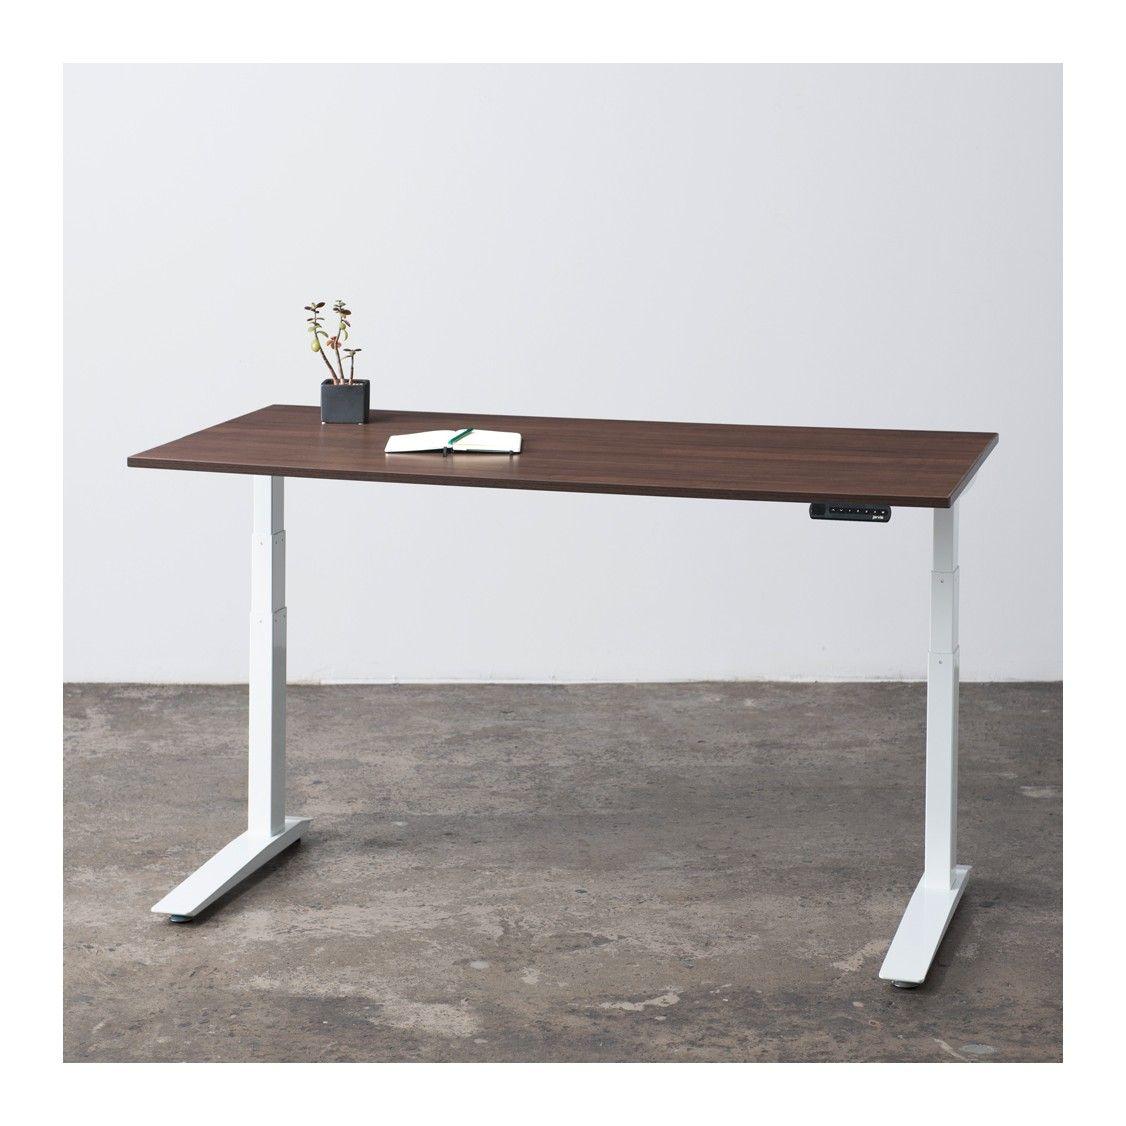 Jarvis Standing Desk   GREENGUARD Laminate (walnut)   Fully